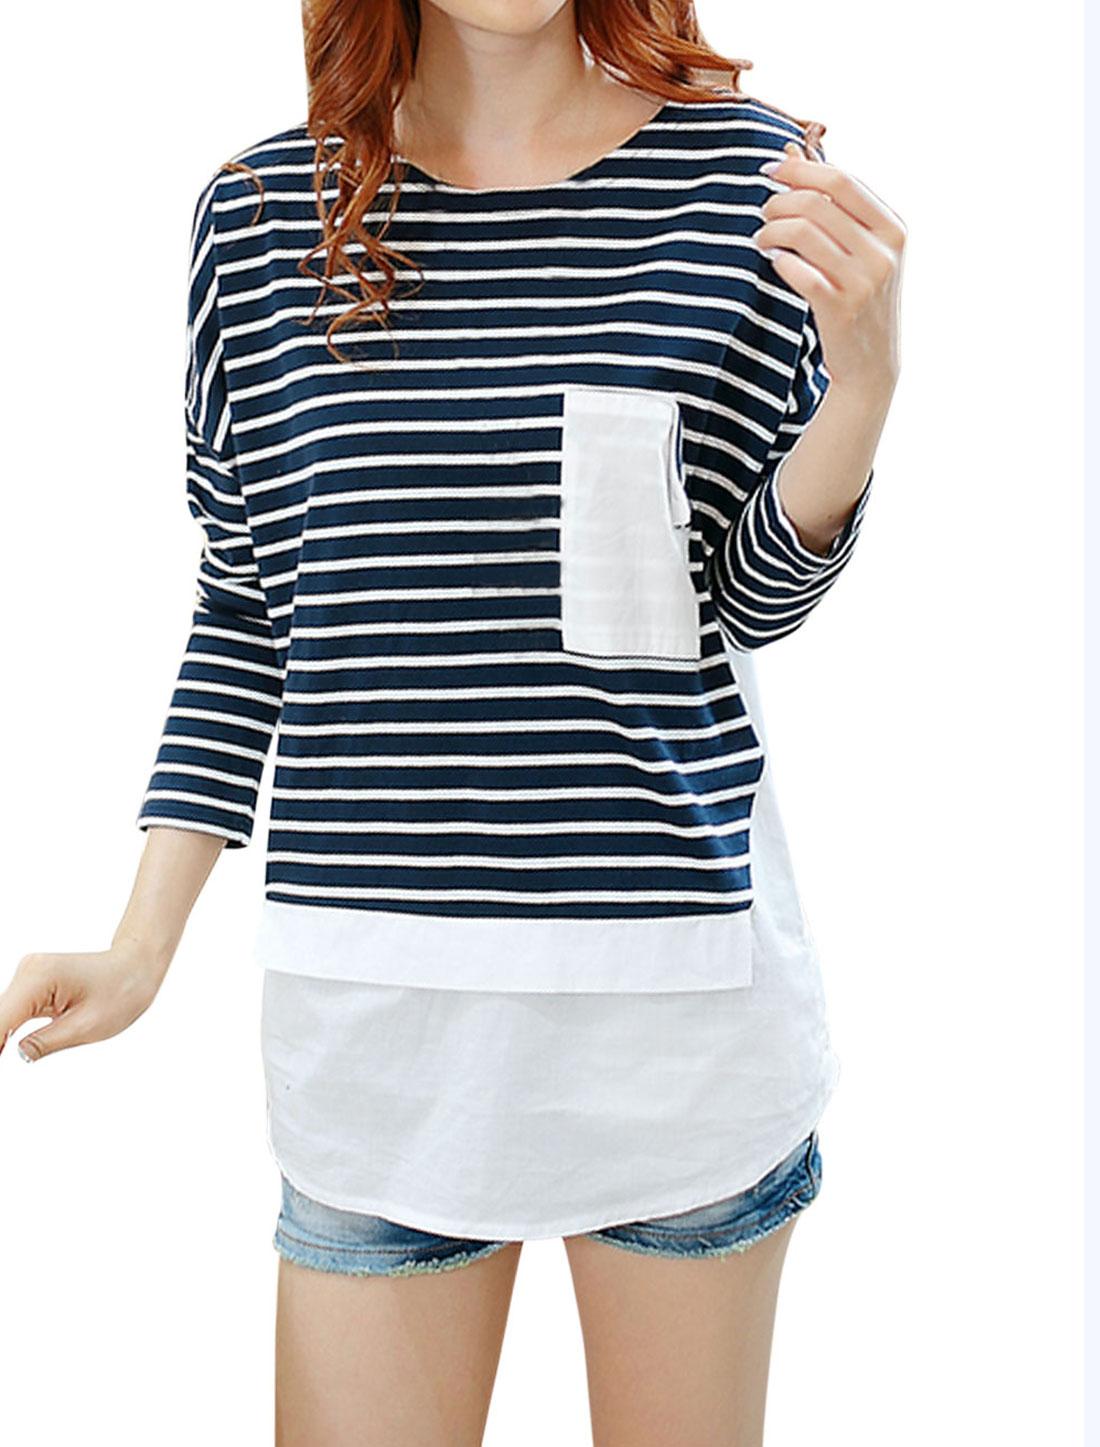 Women Dolman Sleeve Pullover Round Hem Tee Shirt Navy Blue M